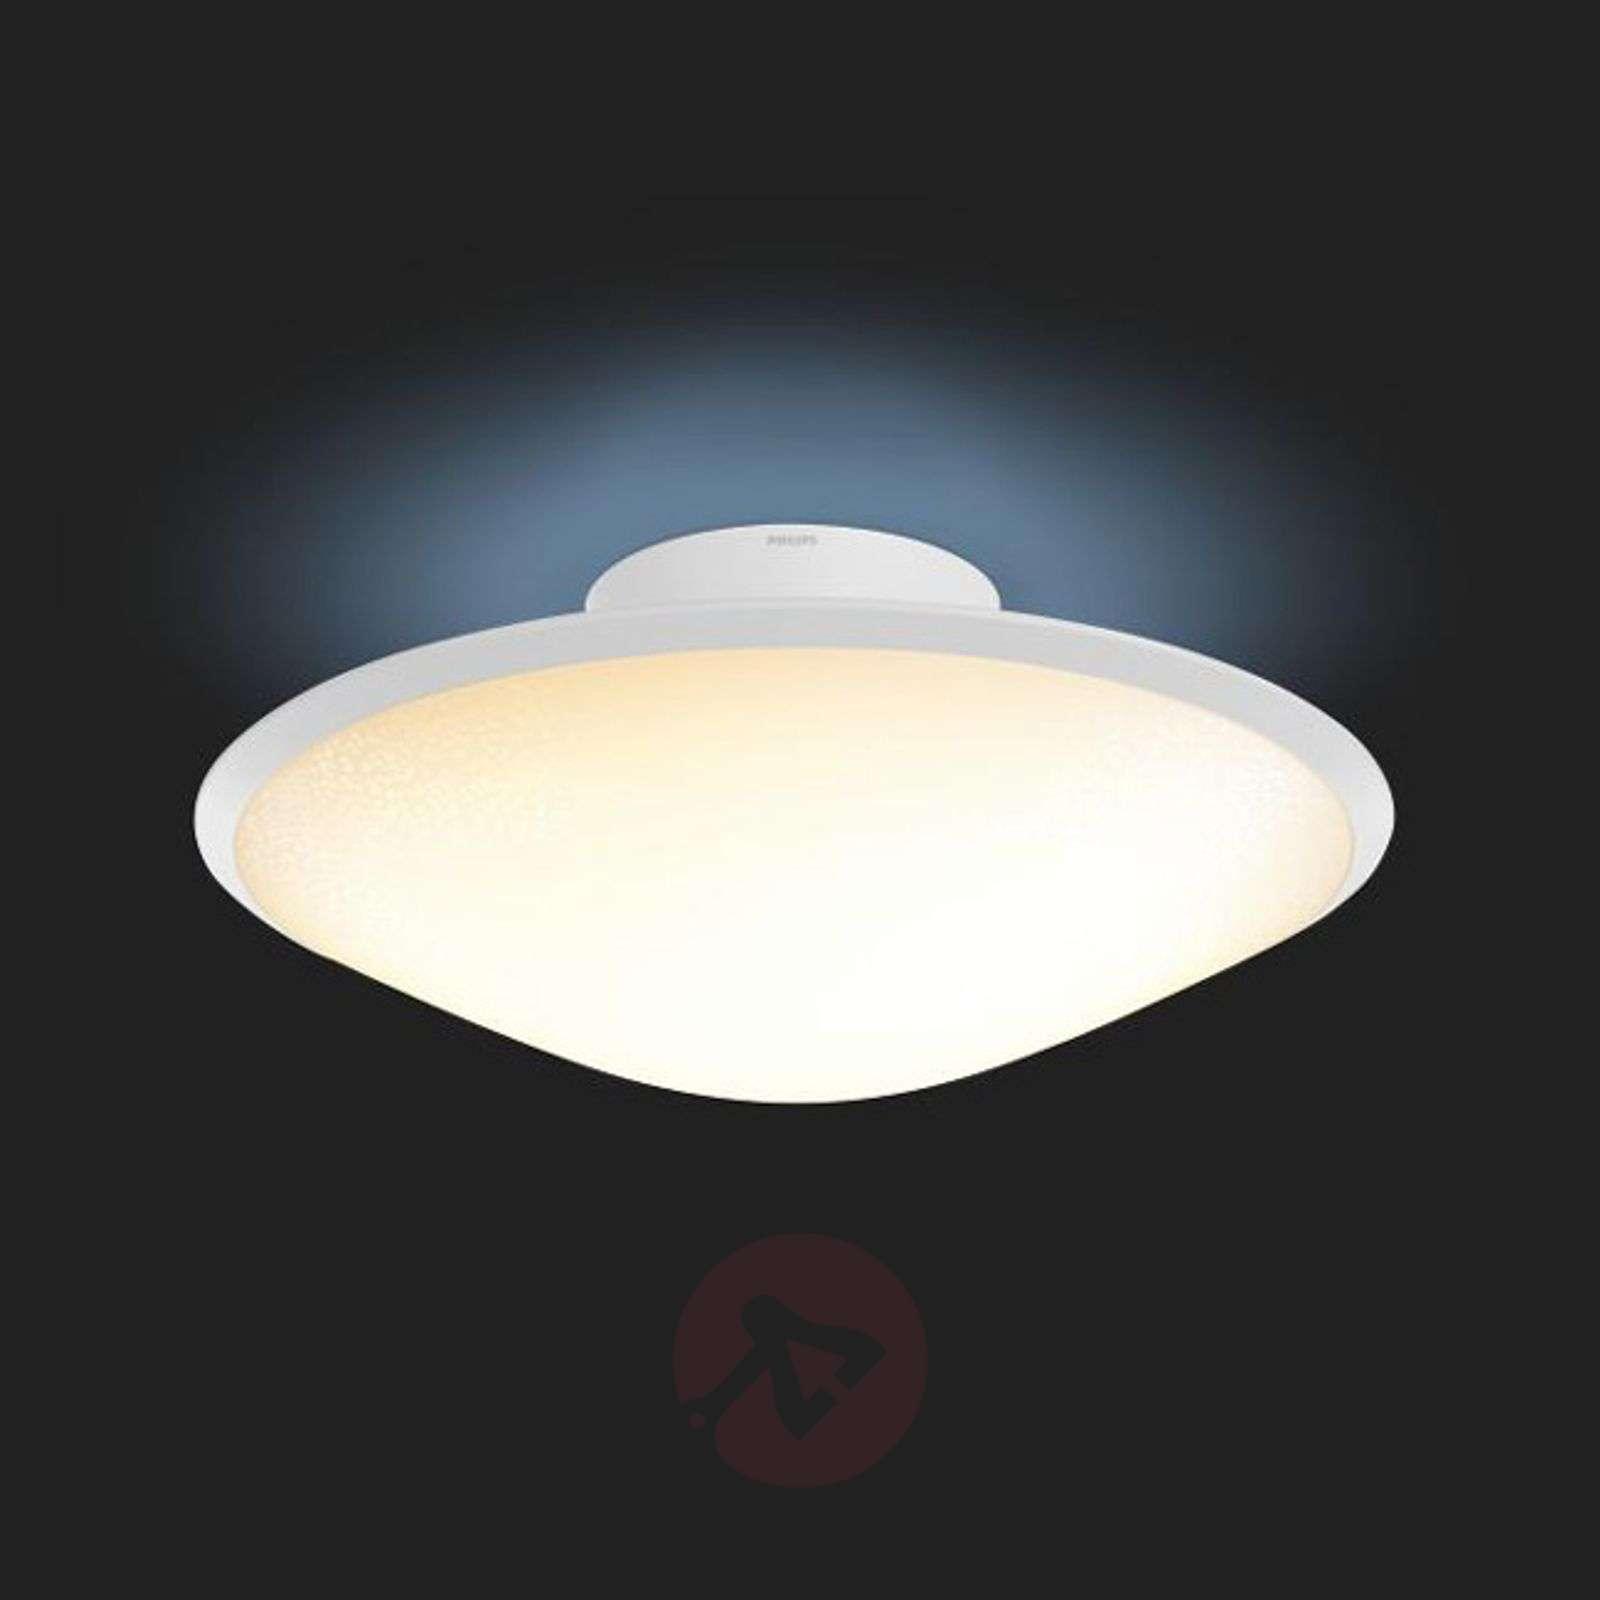 Philips Hue Phoenix ceiling light White Ambiance-7531608-01